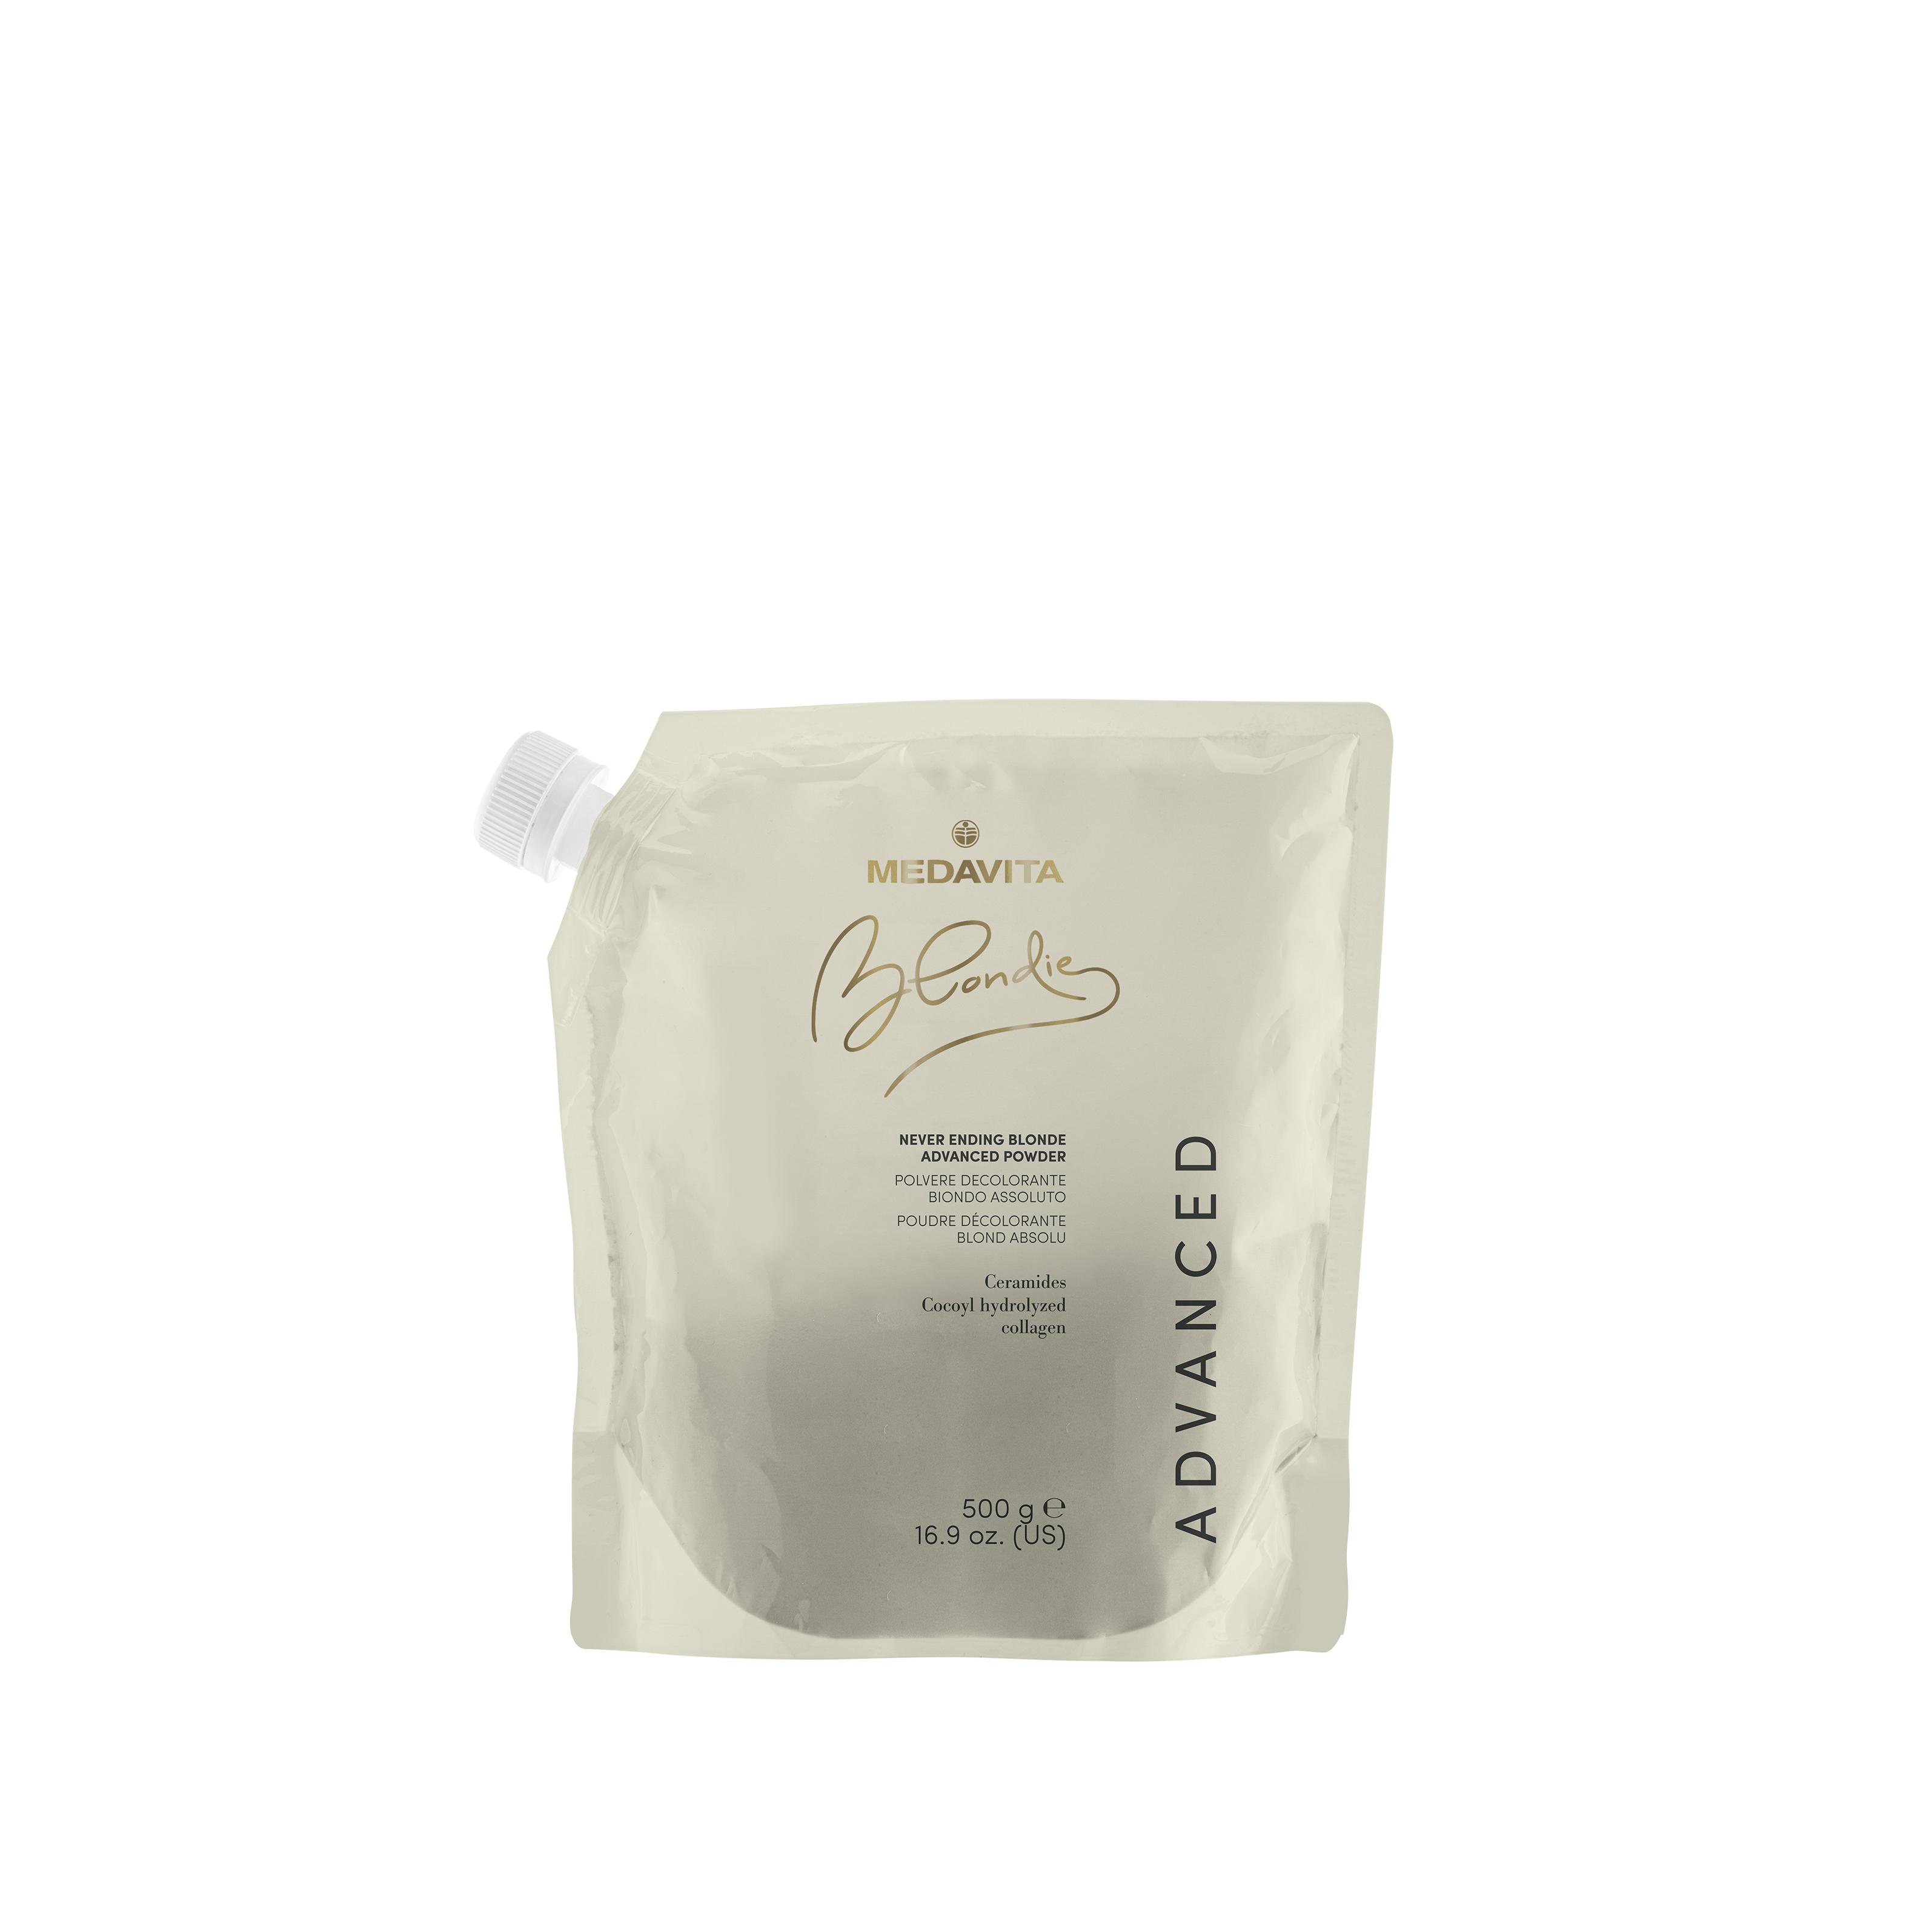 Blondie Smartbag Never Ending Advanced Powder Deco 500gr